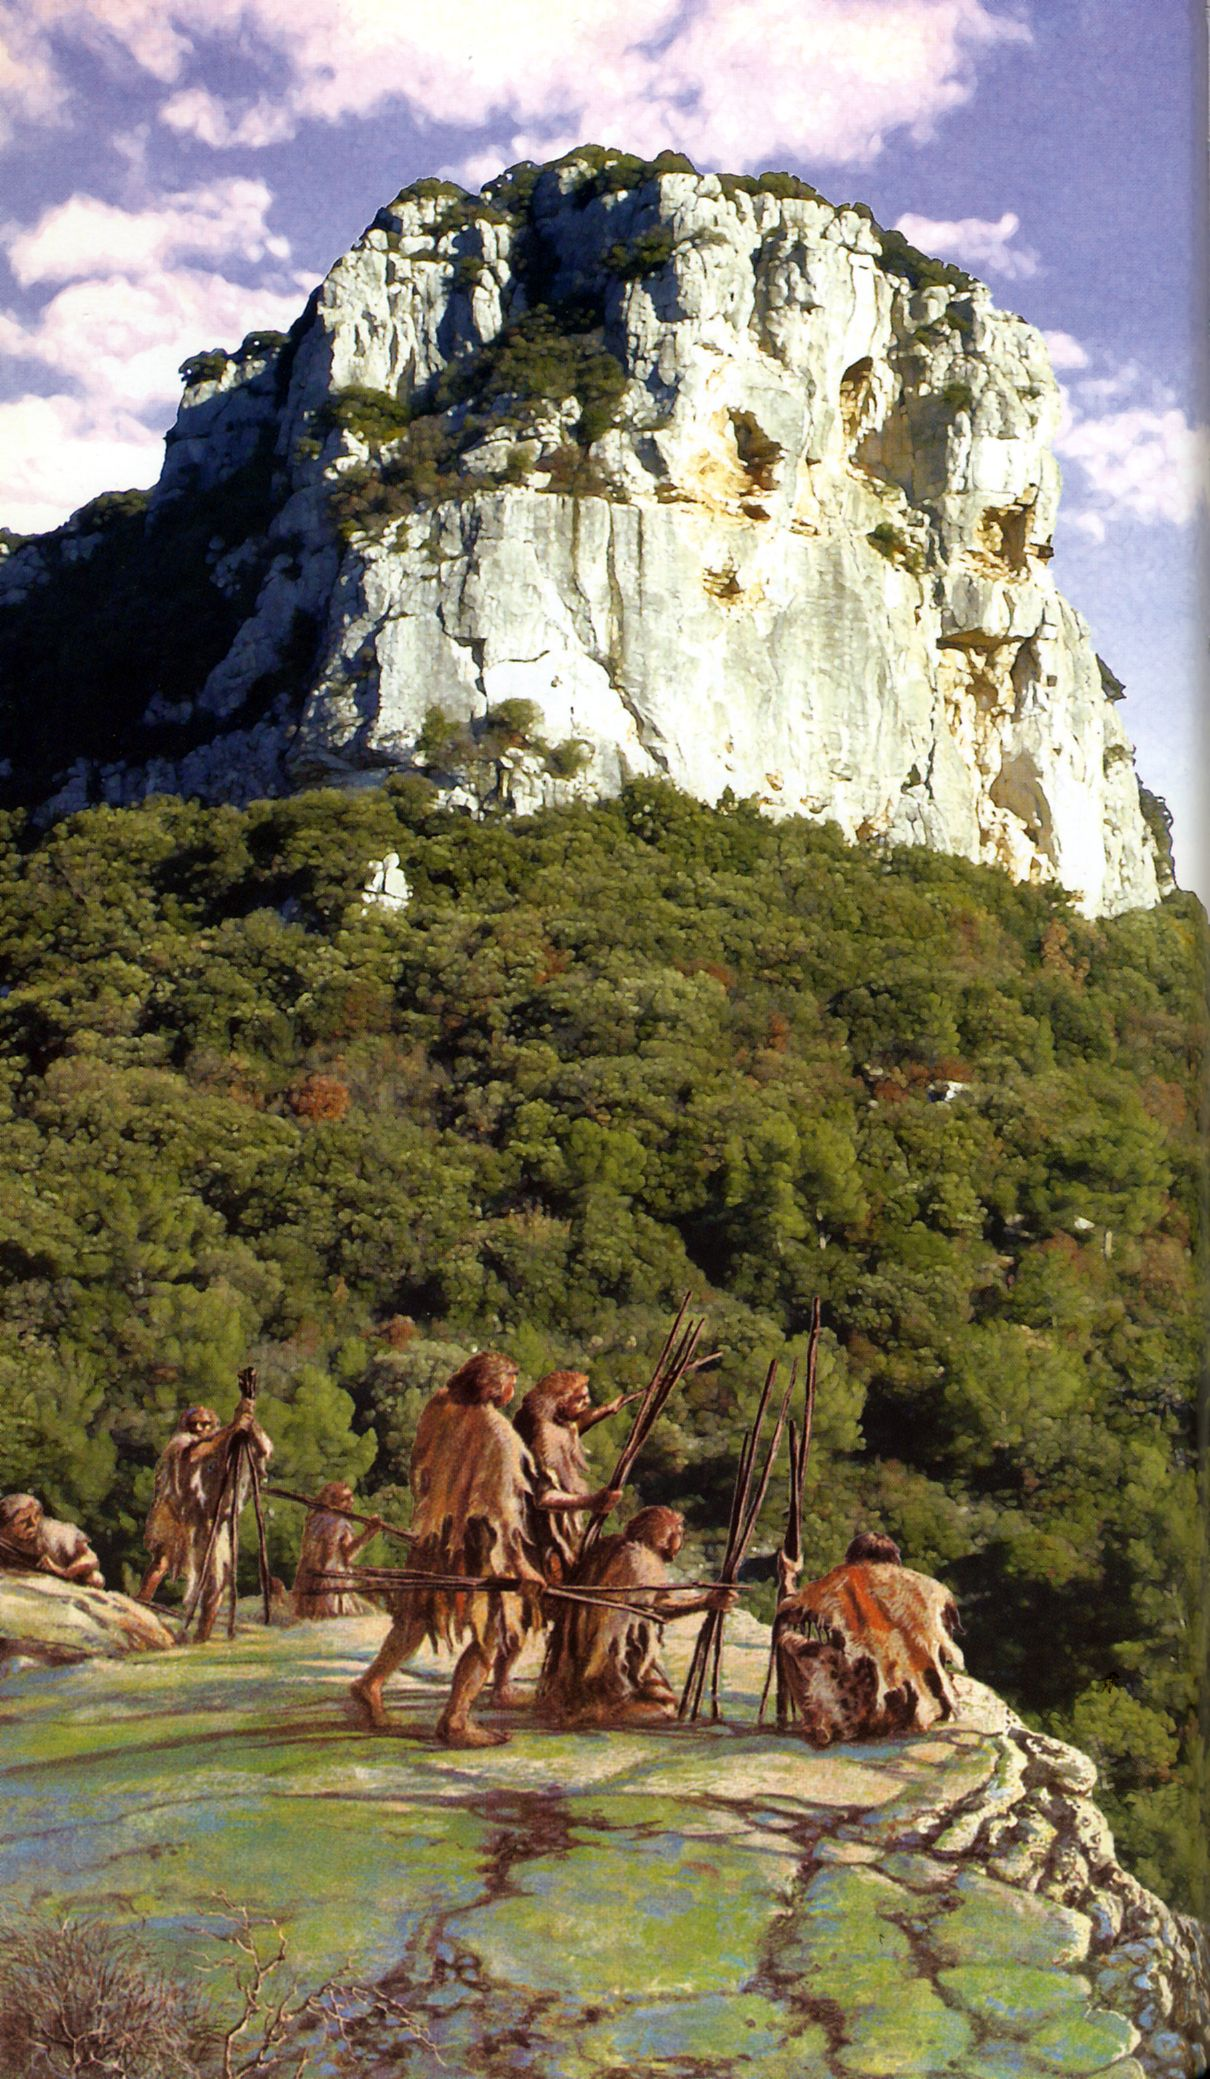 Neanderthals In Paleolithic Liguria By Studio Inklink